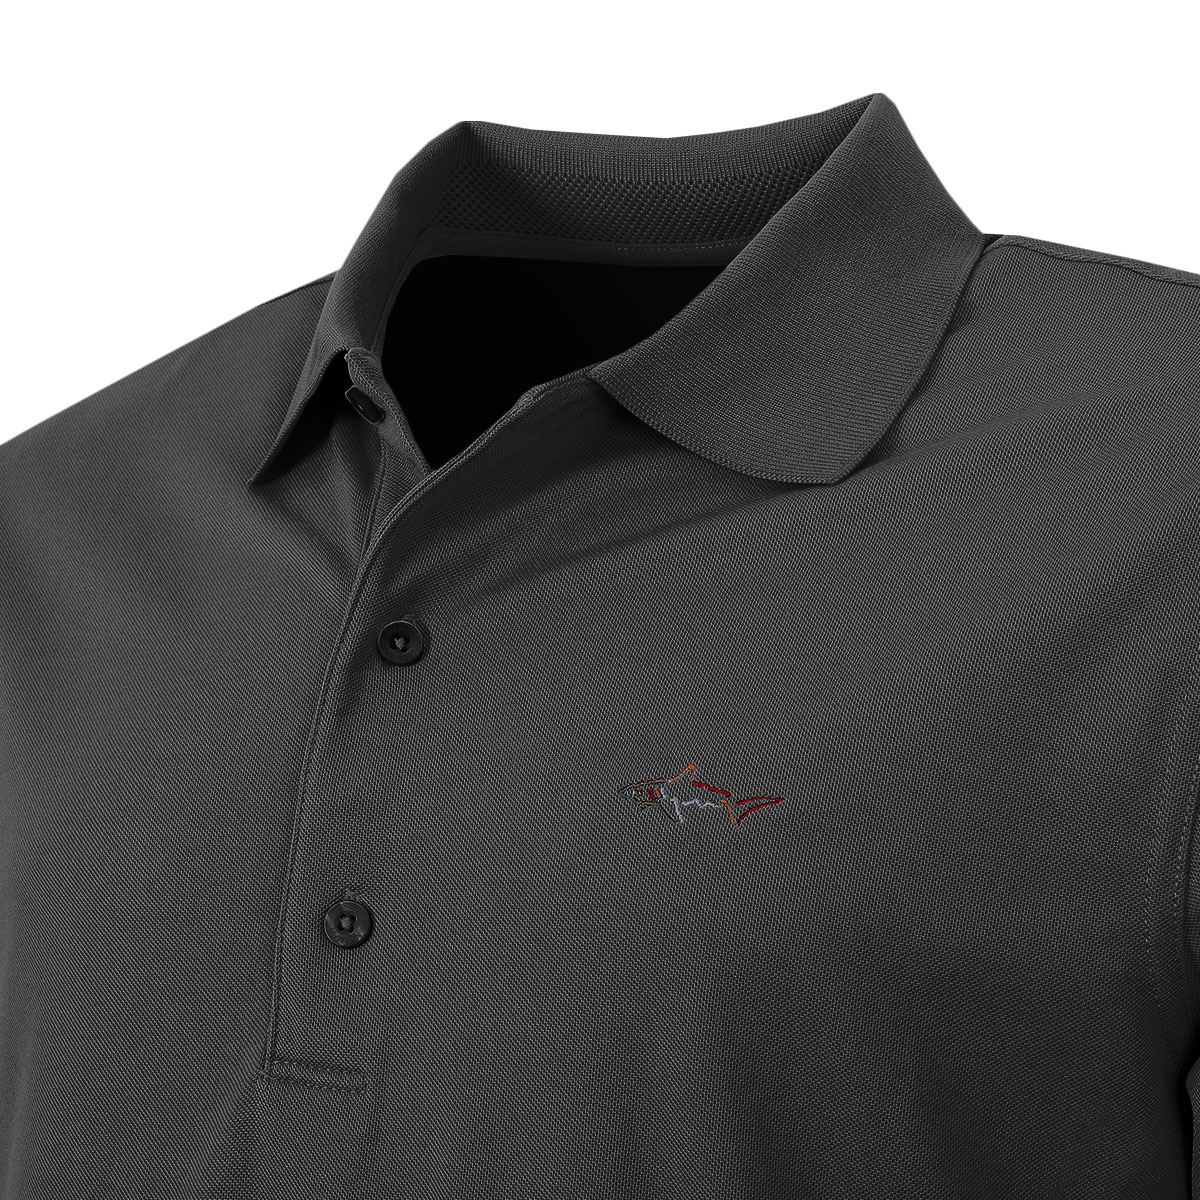 Greg-Norman-Mens-KX04-Performance-Micro-Pique-Golf-Polo-Shirt-28-OFF-RRP thumbnail 66